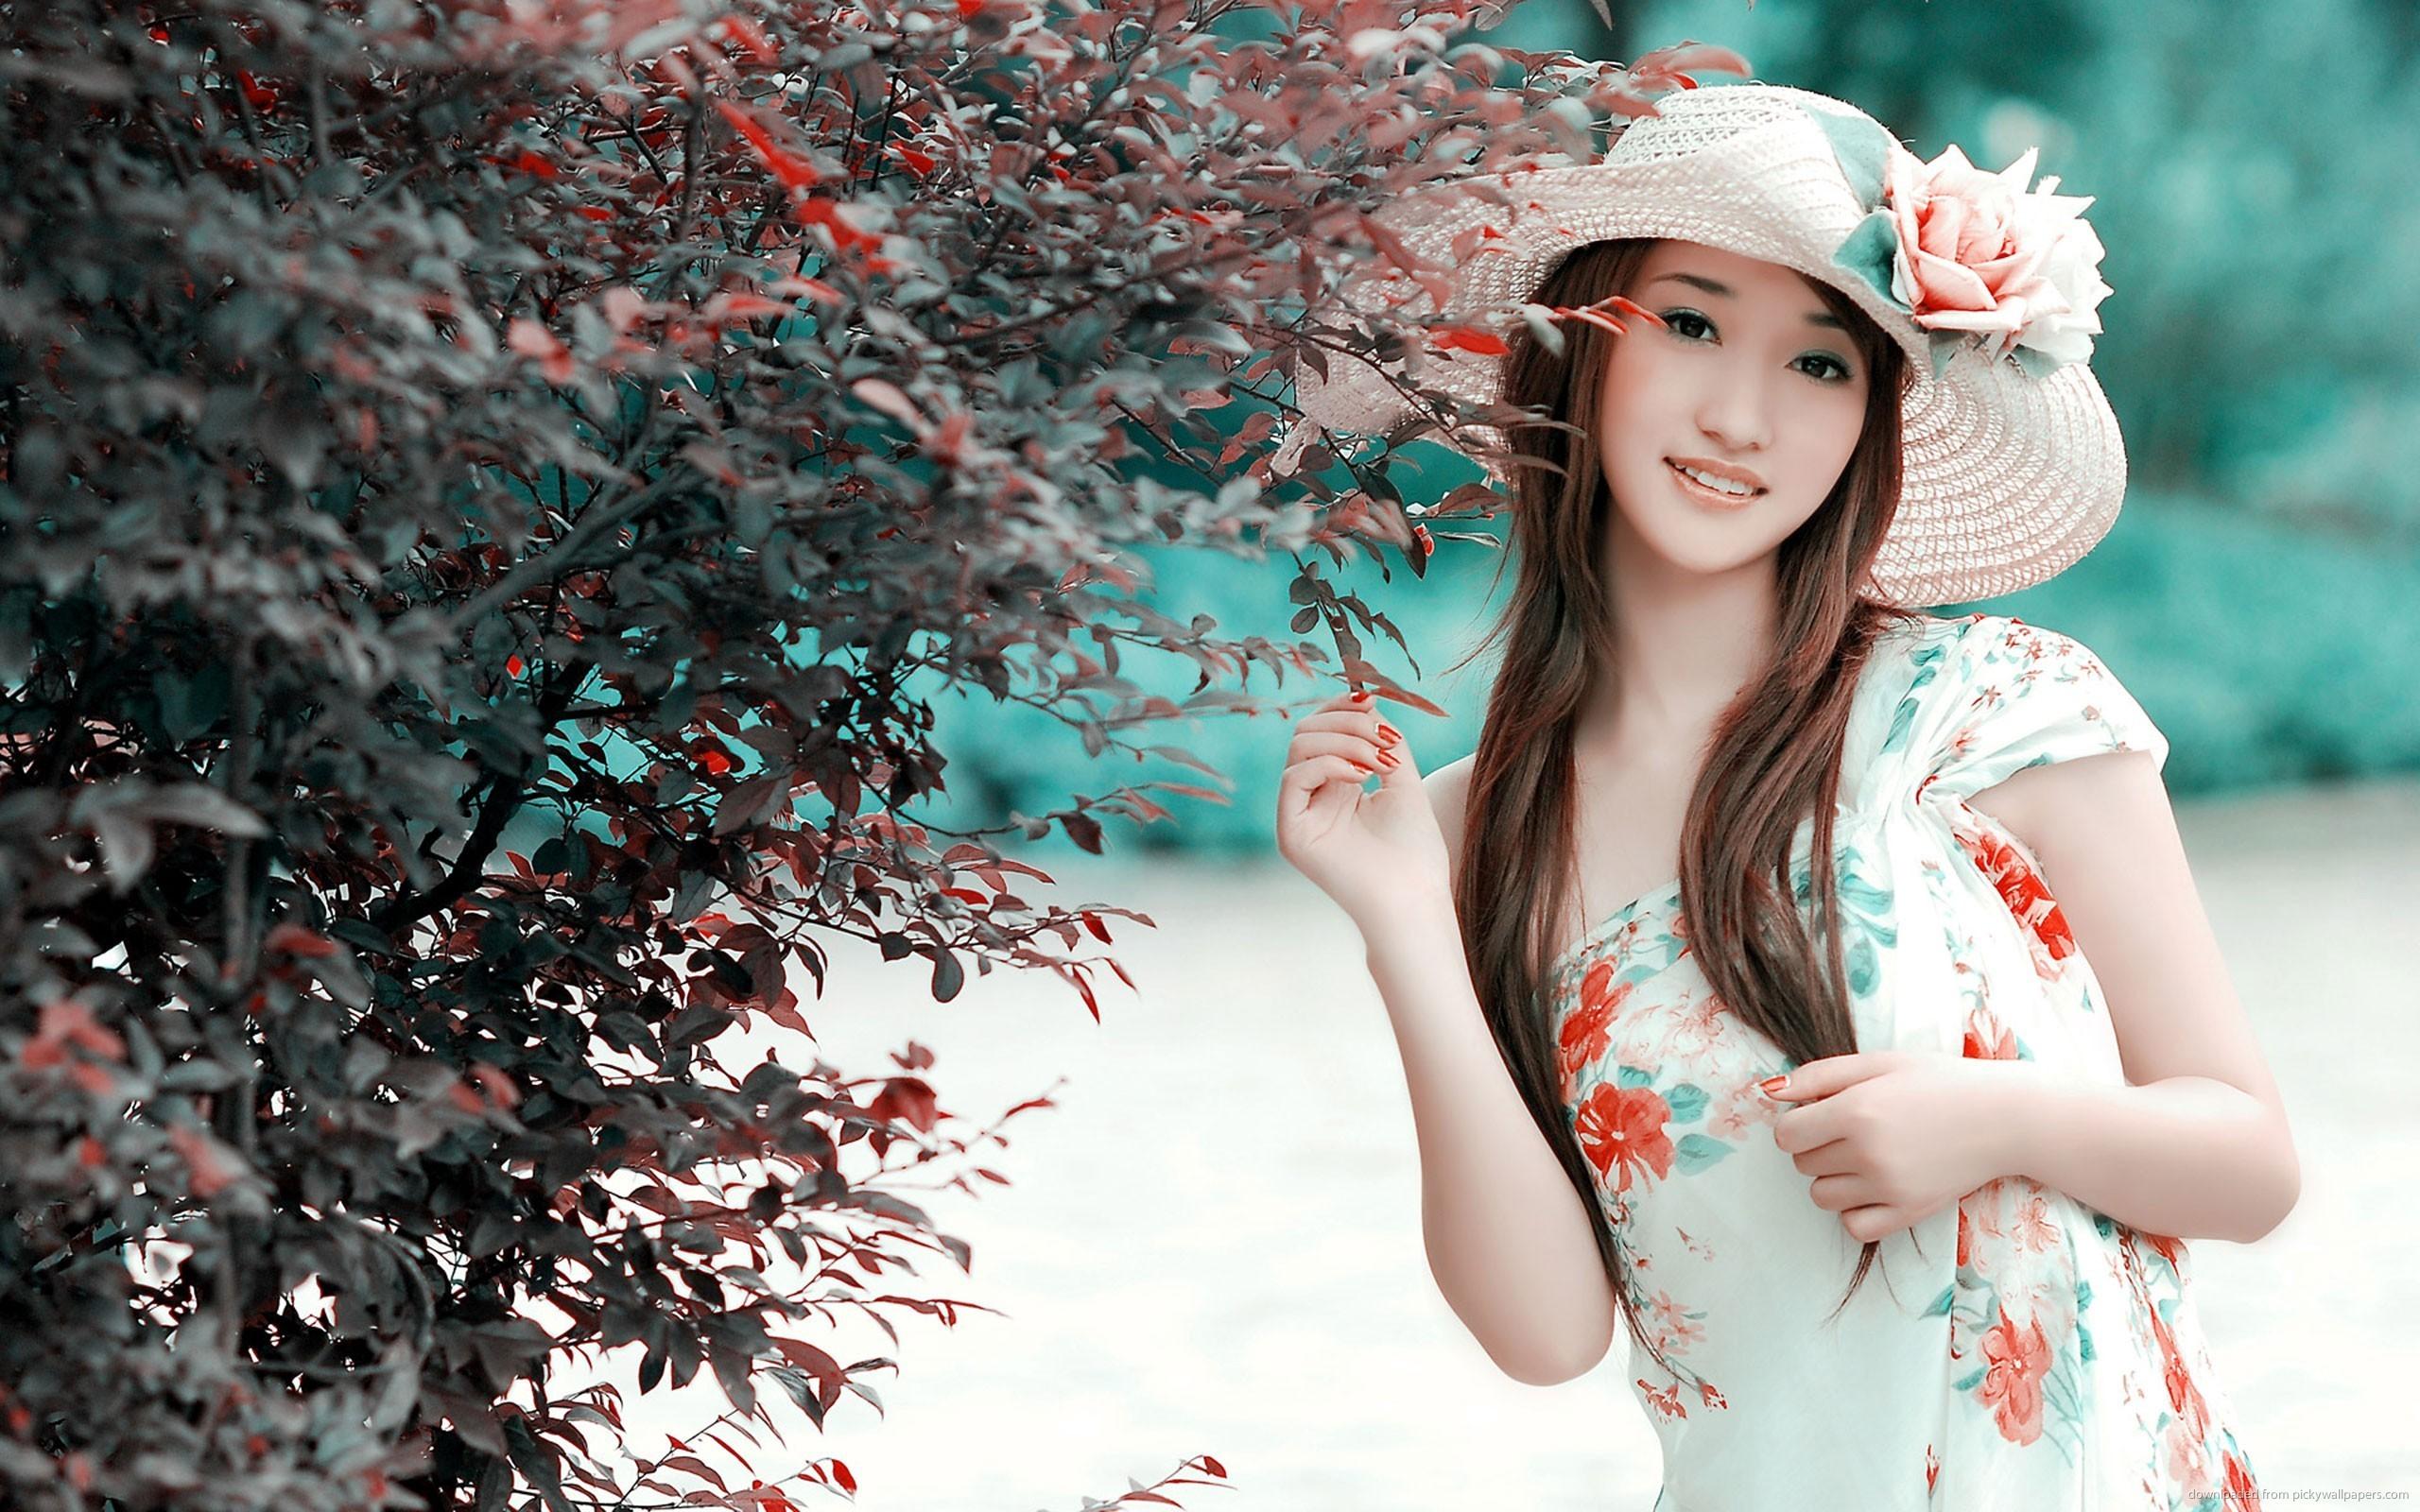 Cute-asian-girl-HD-Quality-HD-Desktop-wallpaper-wp3404304